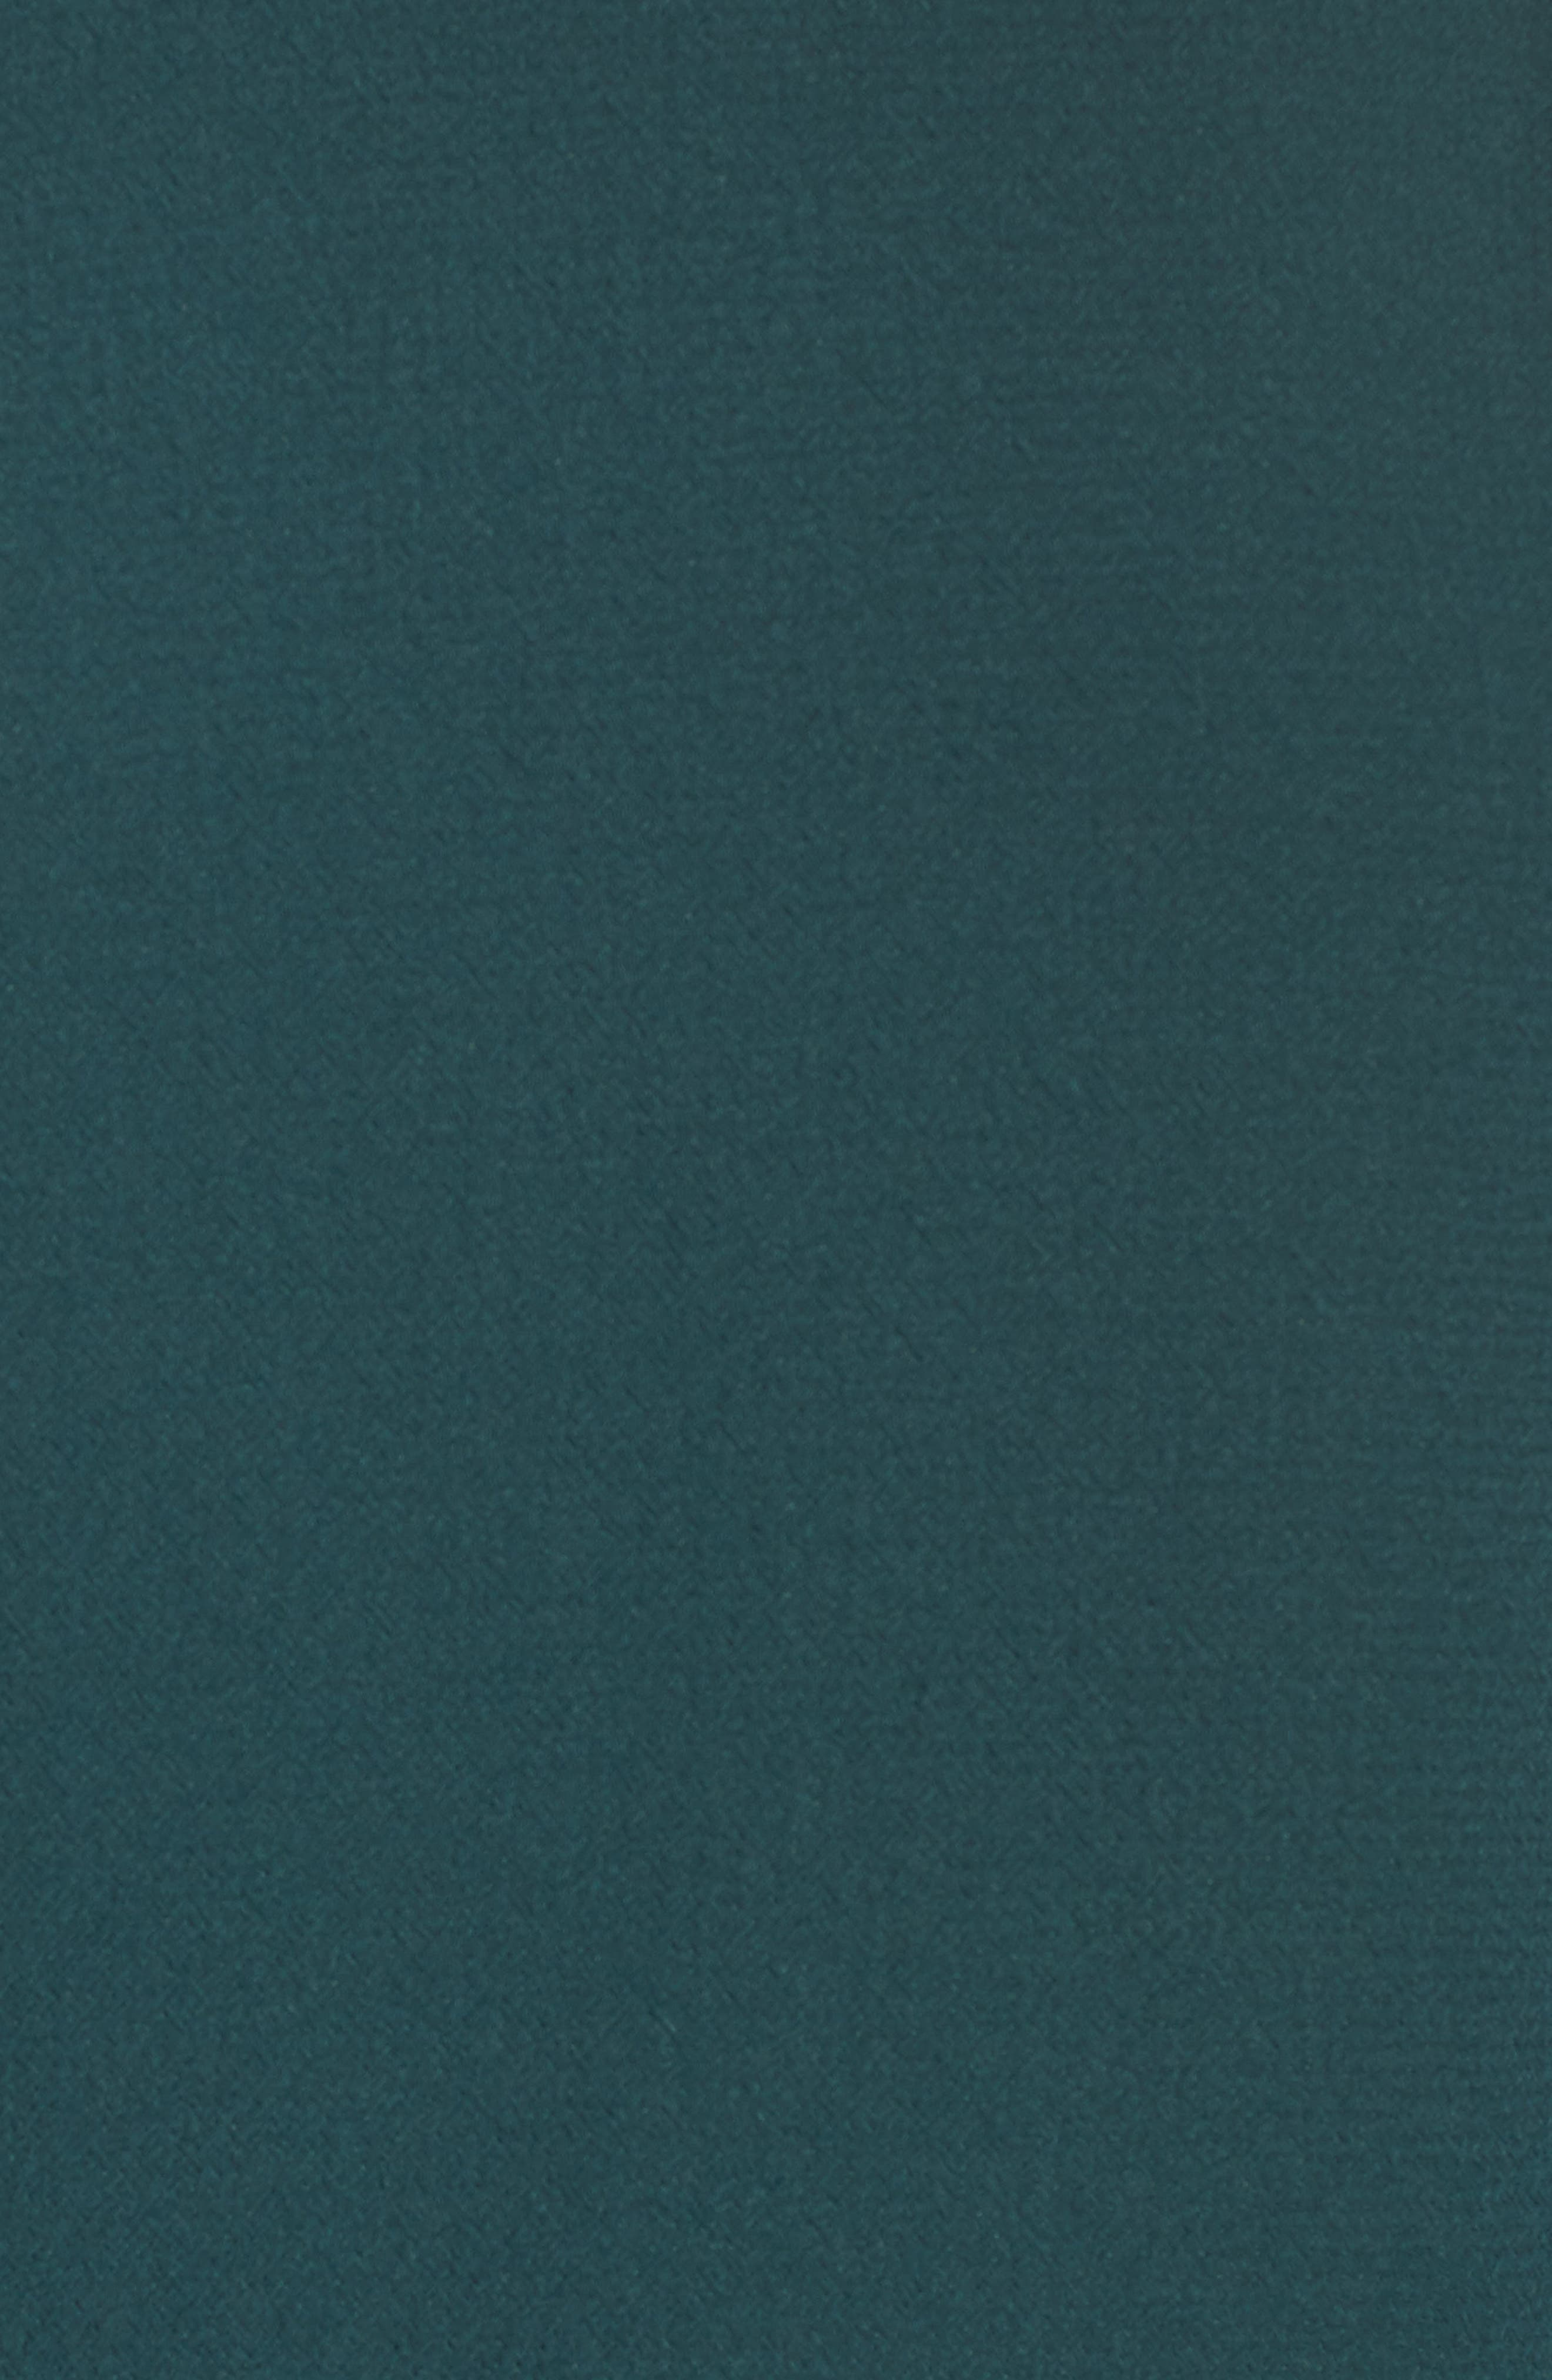 Bishop Sleeve Shift Dress,                             Alternate thumbnail 5, color,                             302